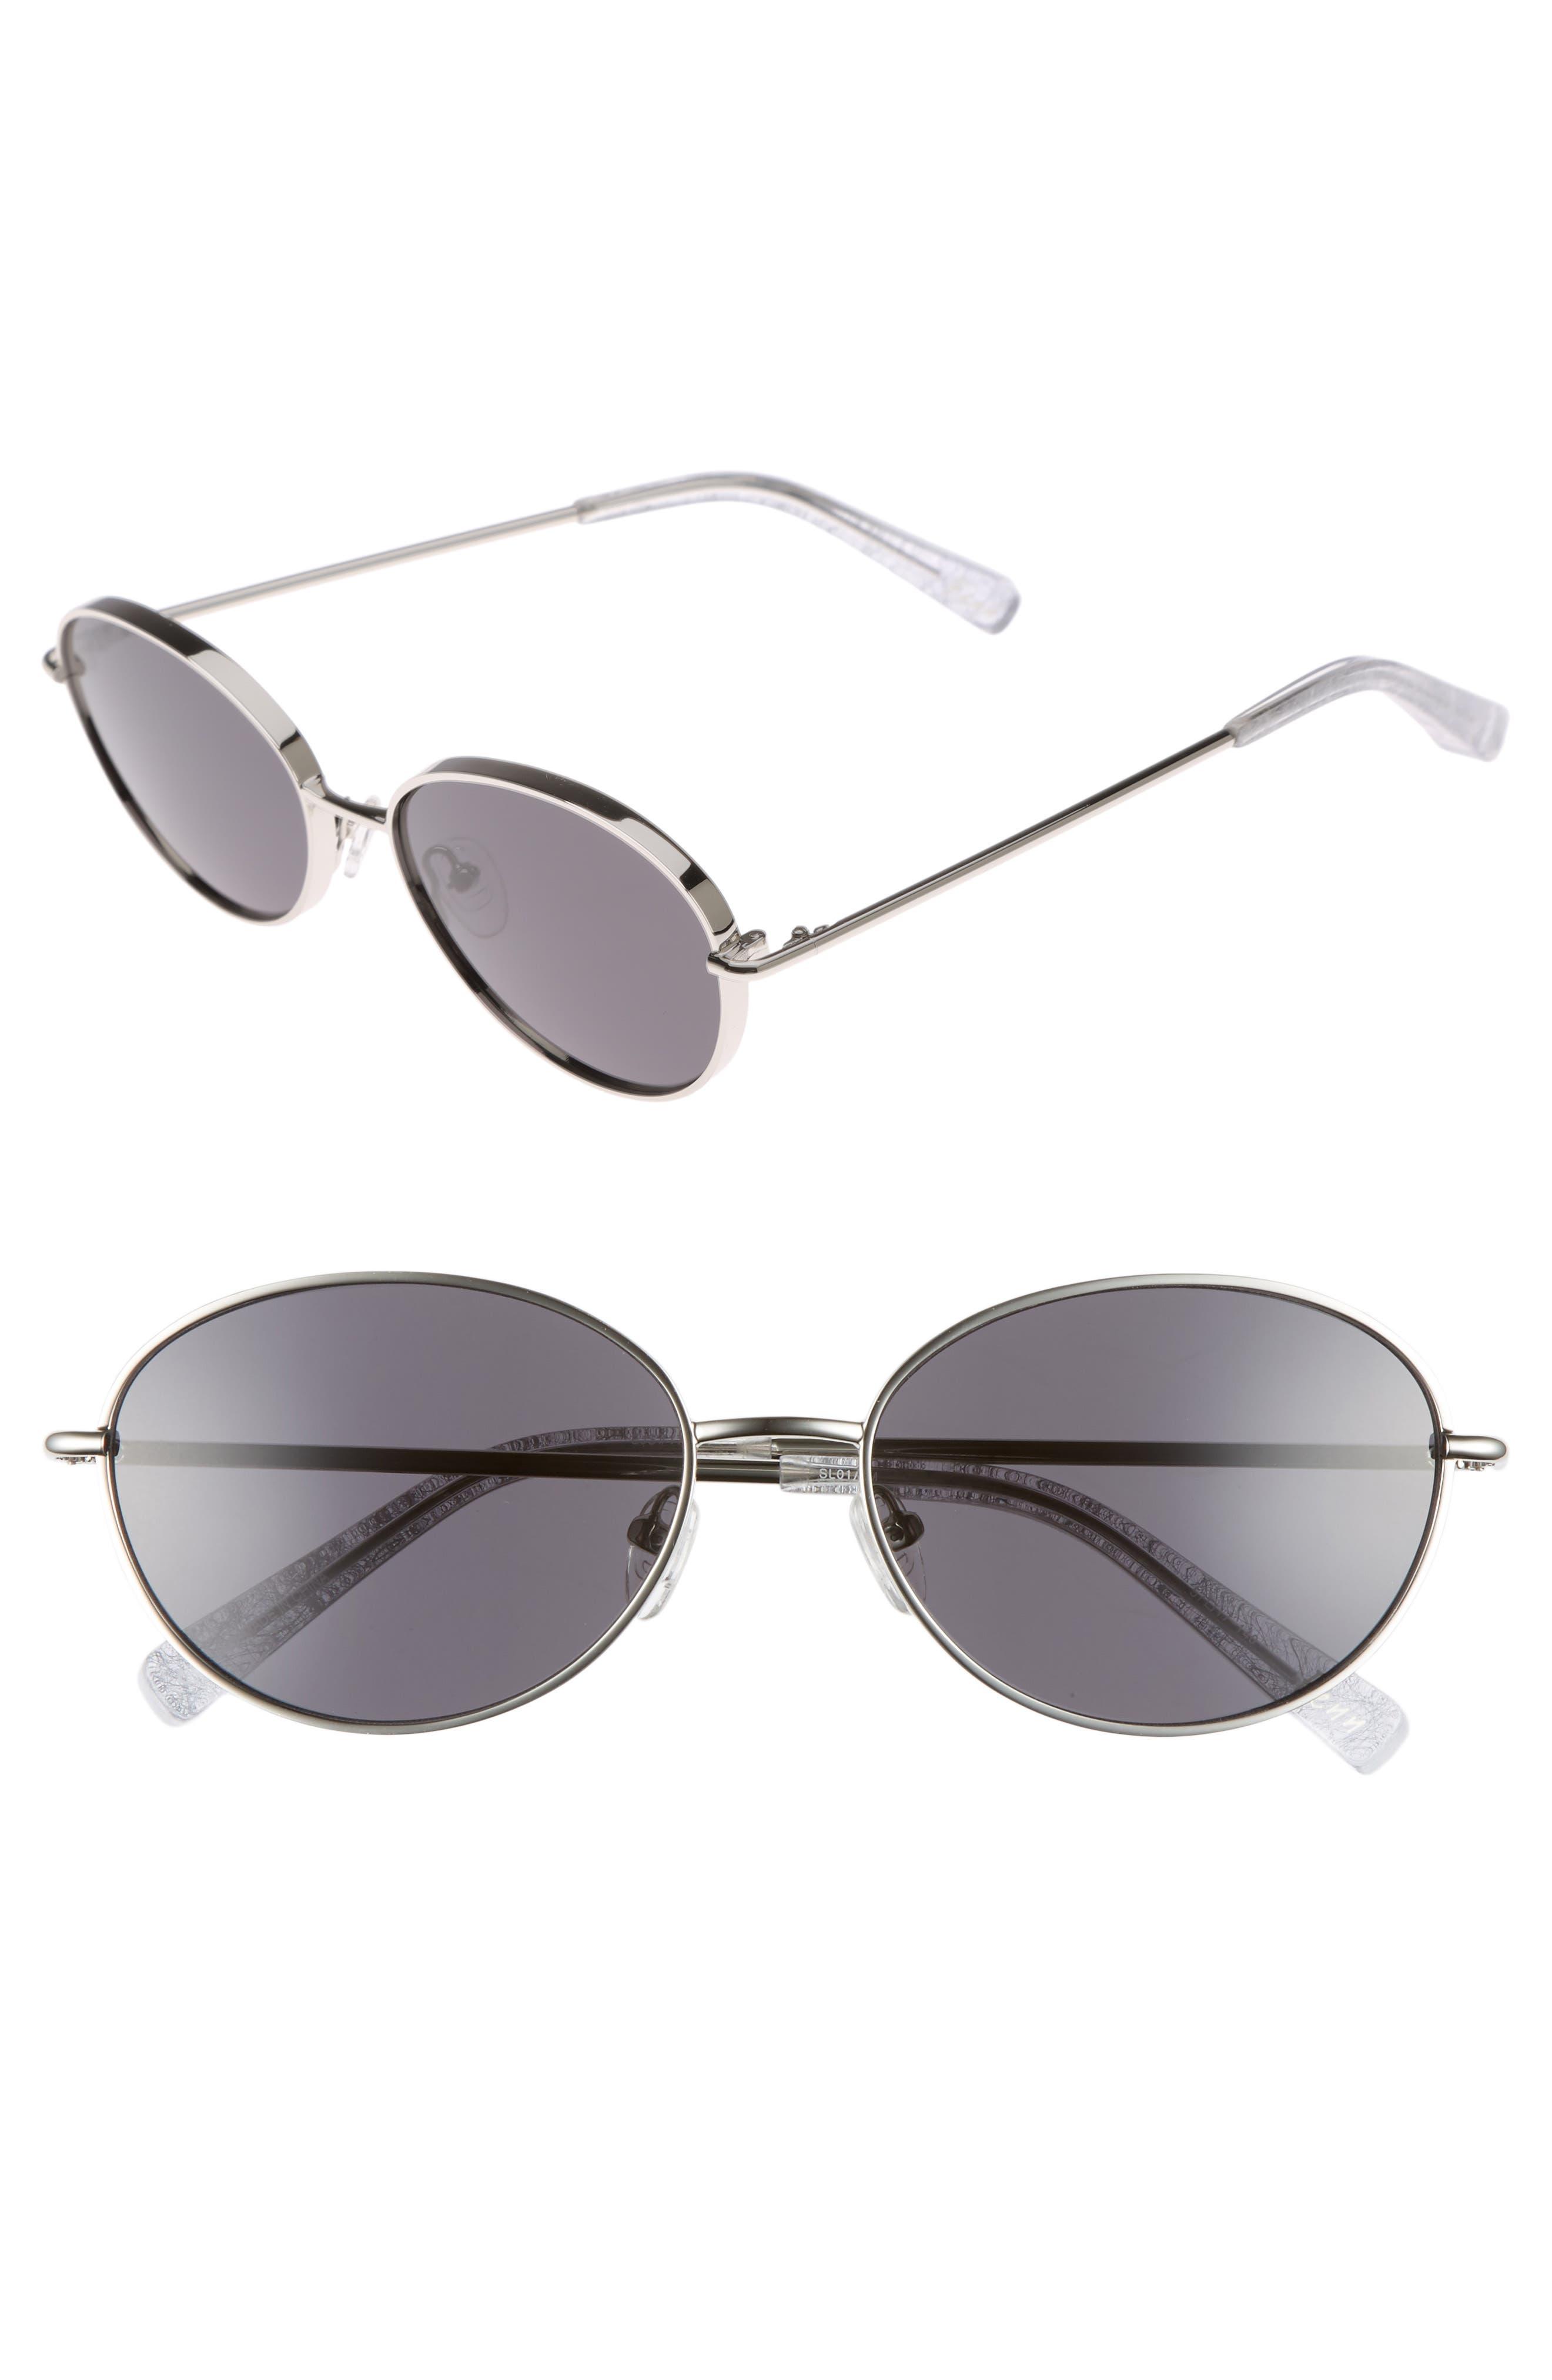 Fenn 57mm Oval Sunglasses,                         Main,                         color, Silver